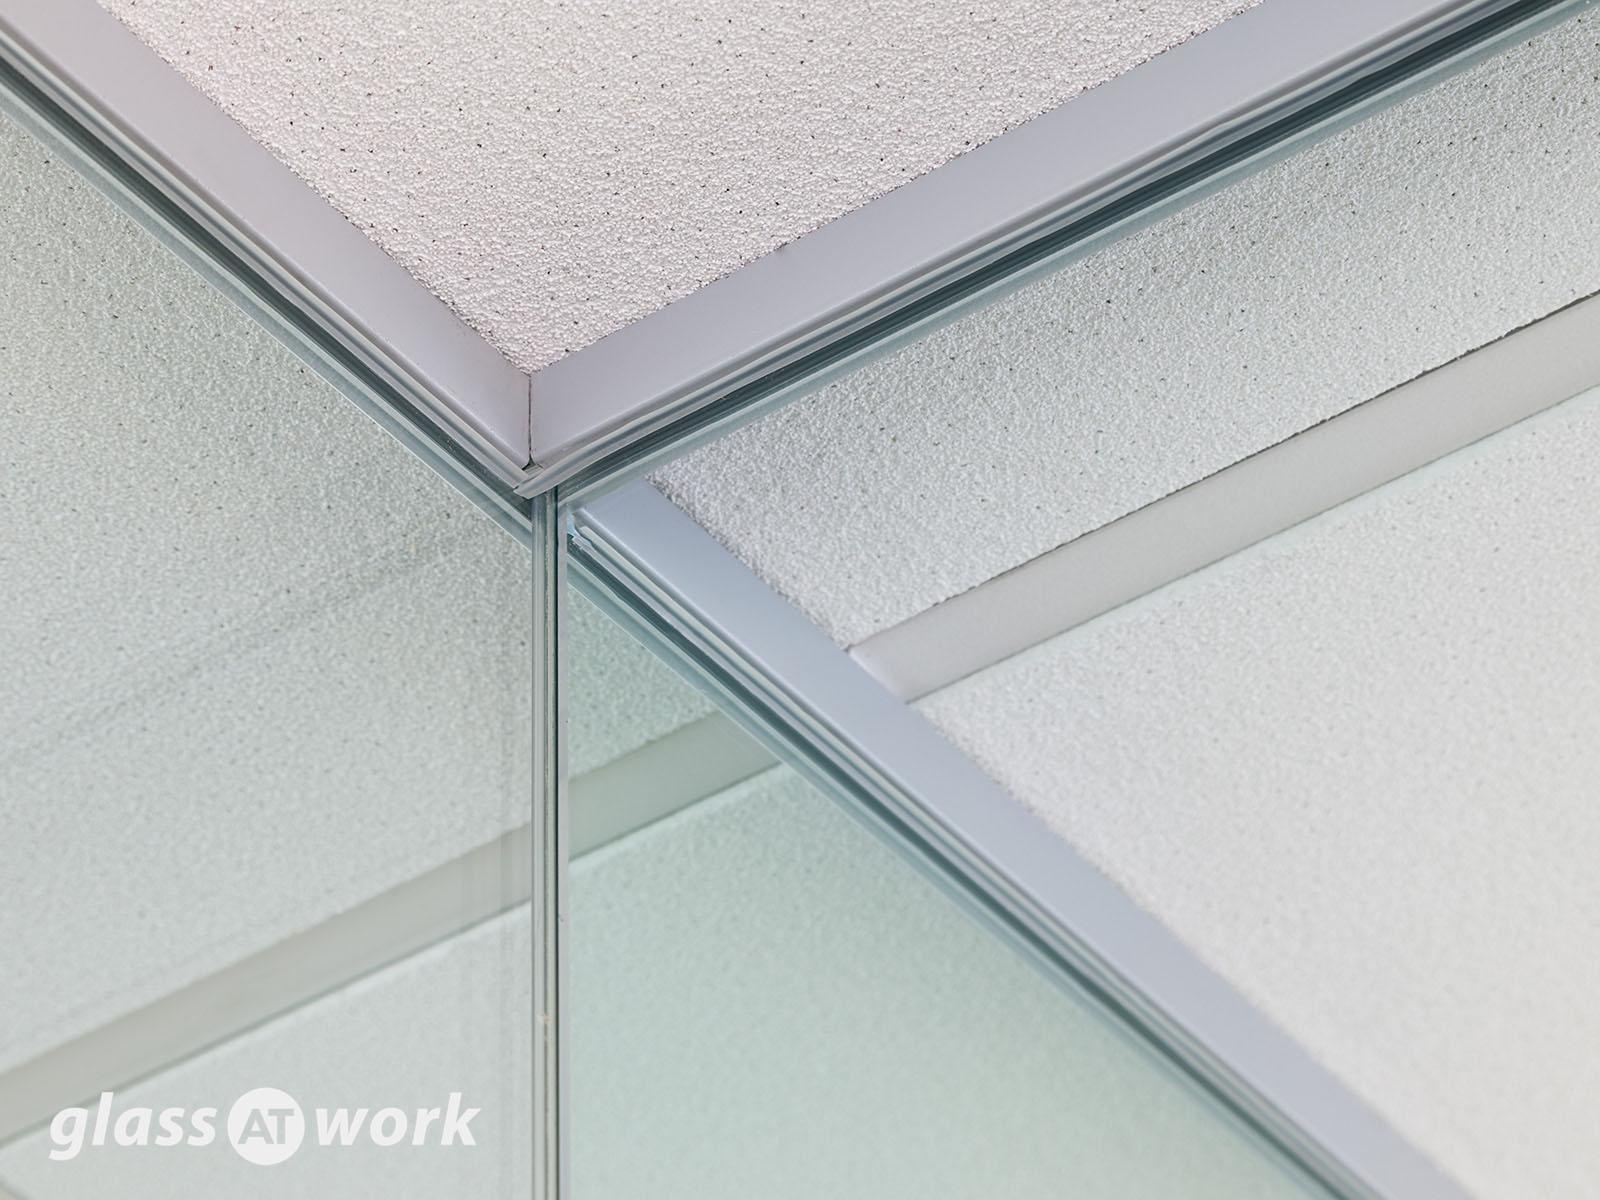 Frameless glass wall details - Single Glazed Frameless Glass Office Partitioning